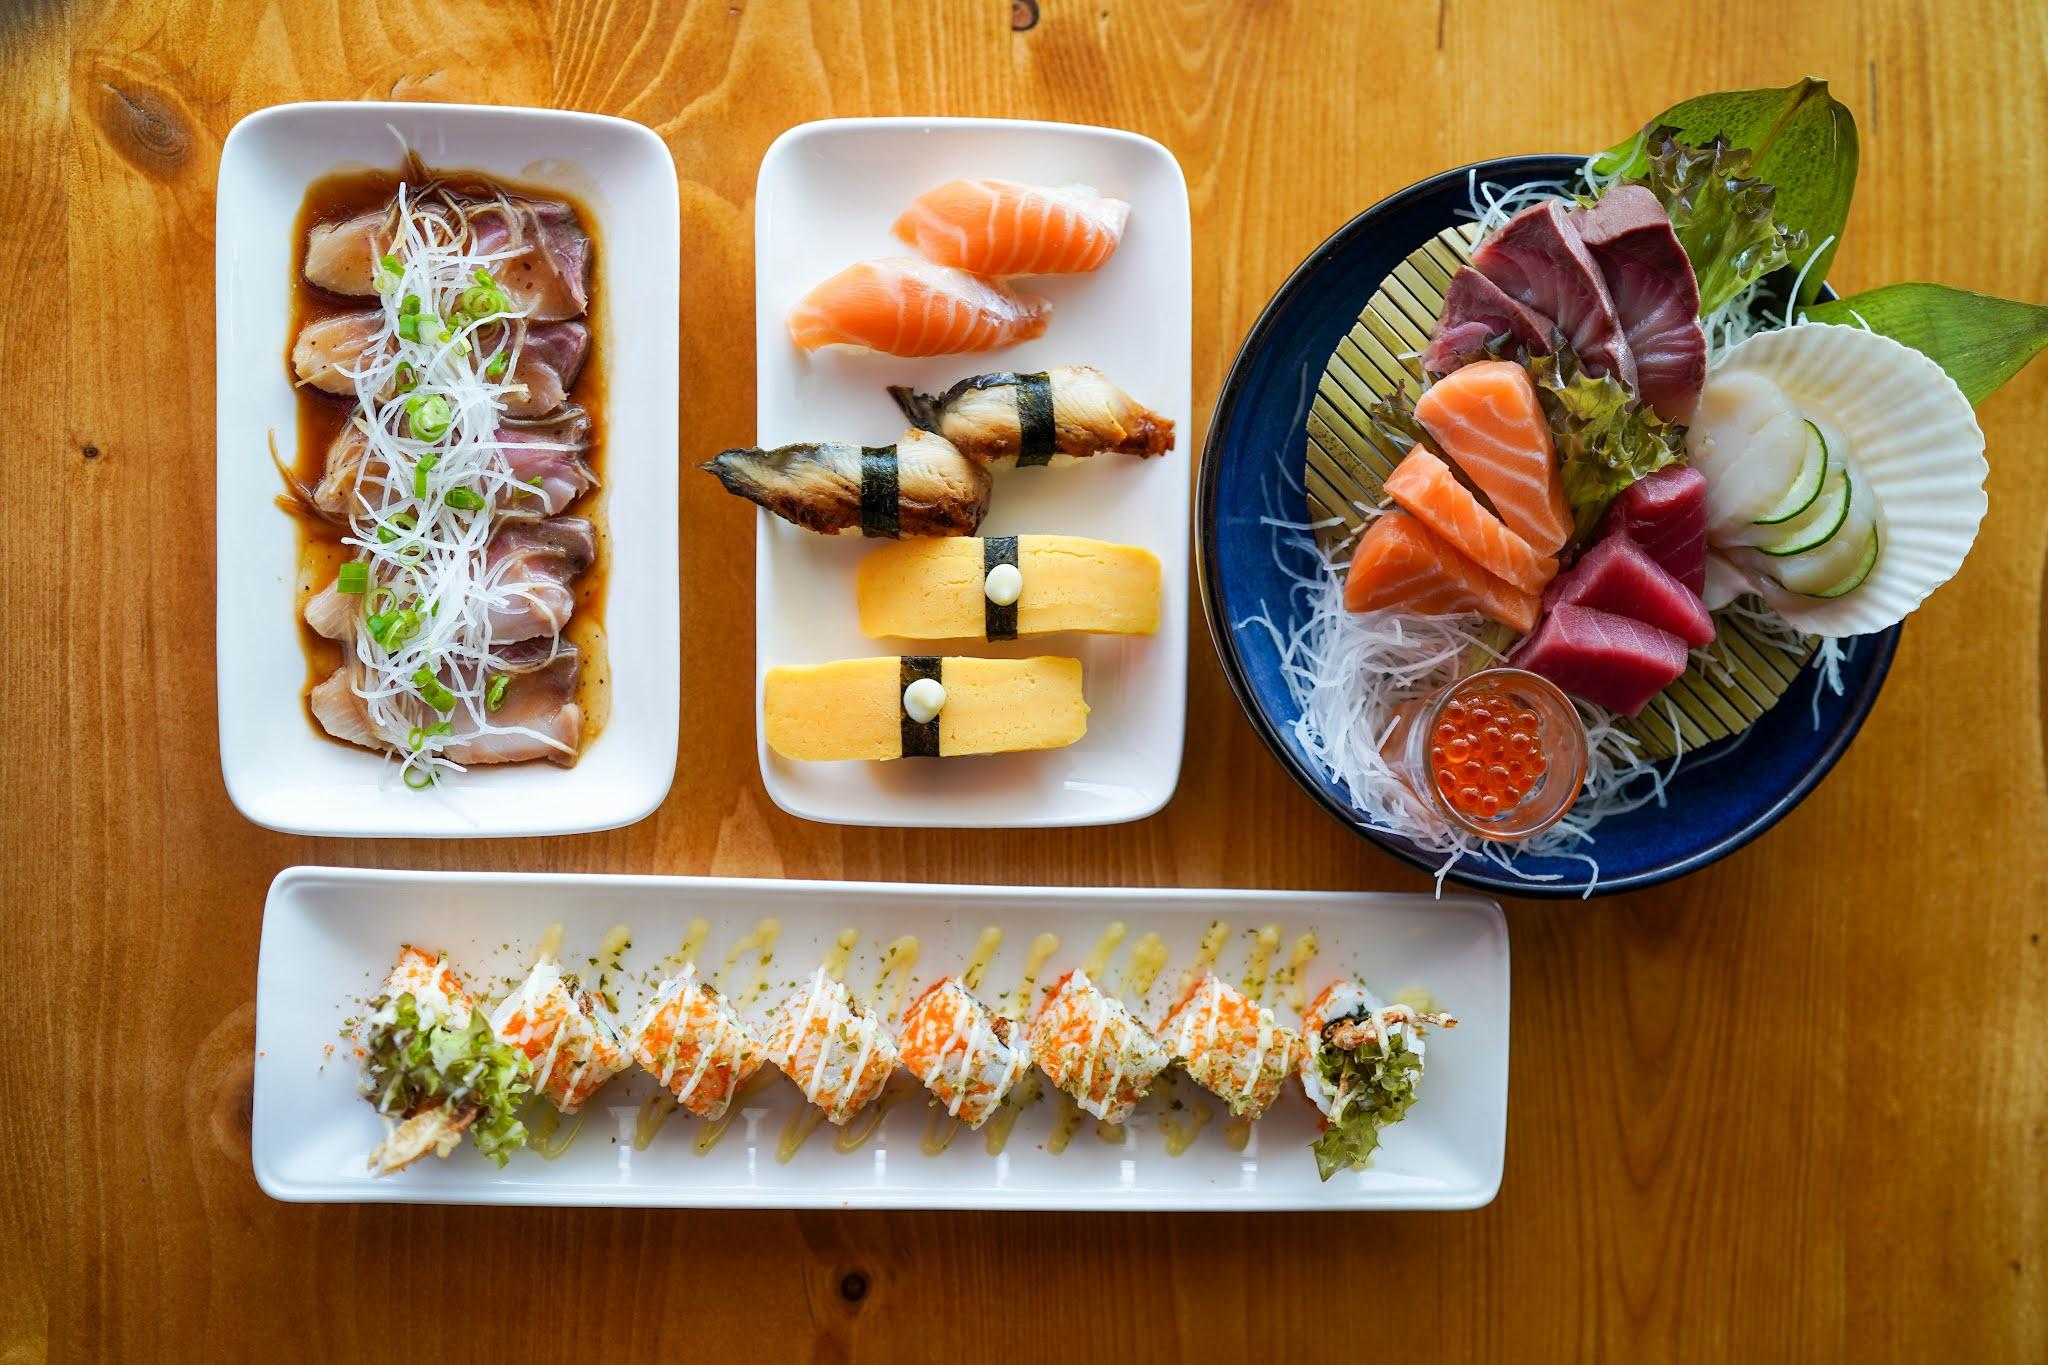 juu nana sakaba: section 17's izakaya welcomes patrons back with a wider menu of sashimi, sushi & more